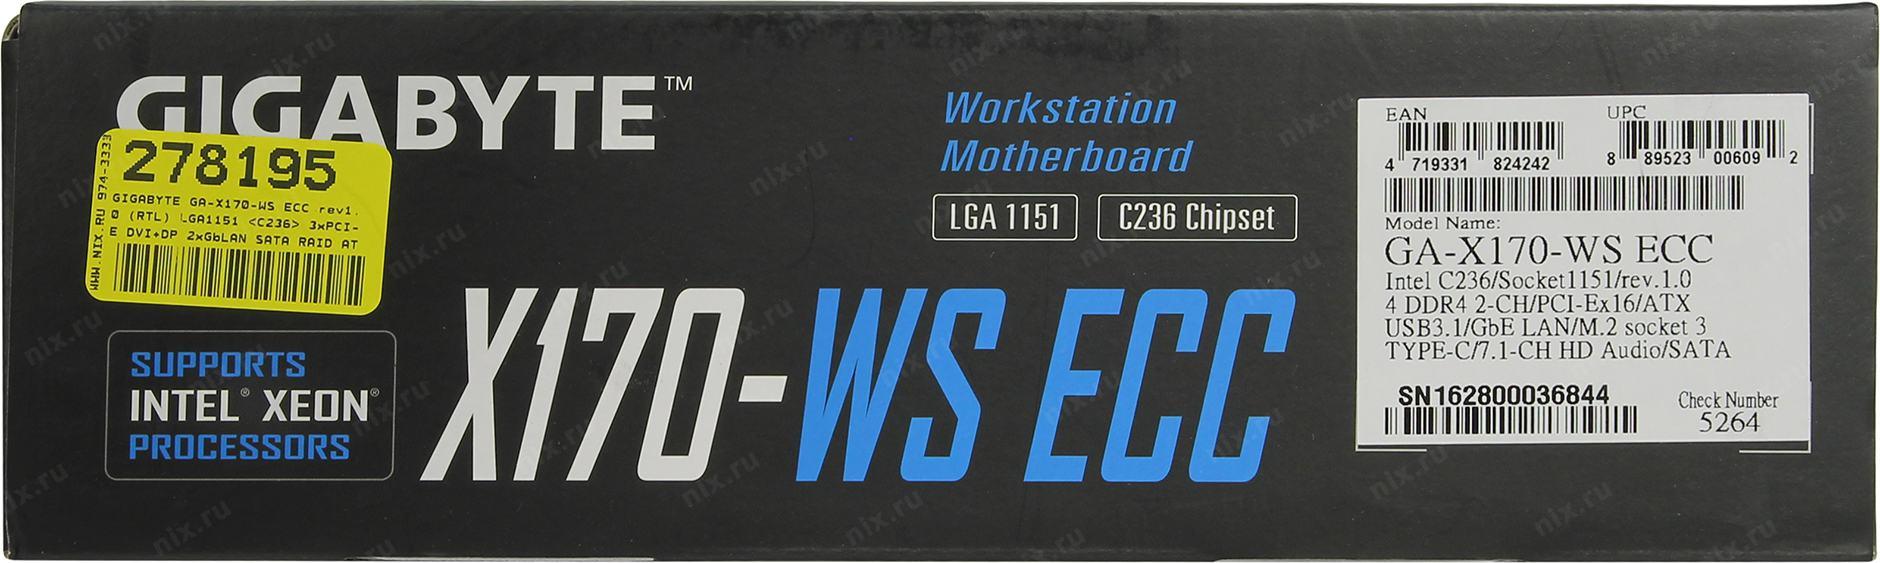 Driver: Gigabyte GA-X170-WS ECC ASMedia SATA